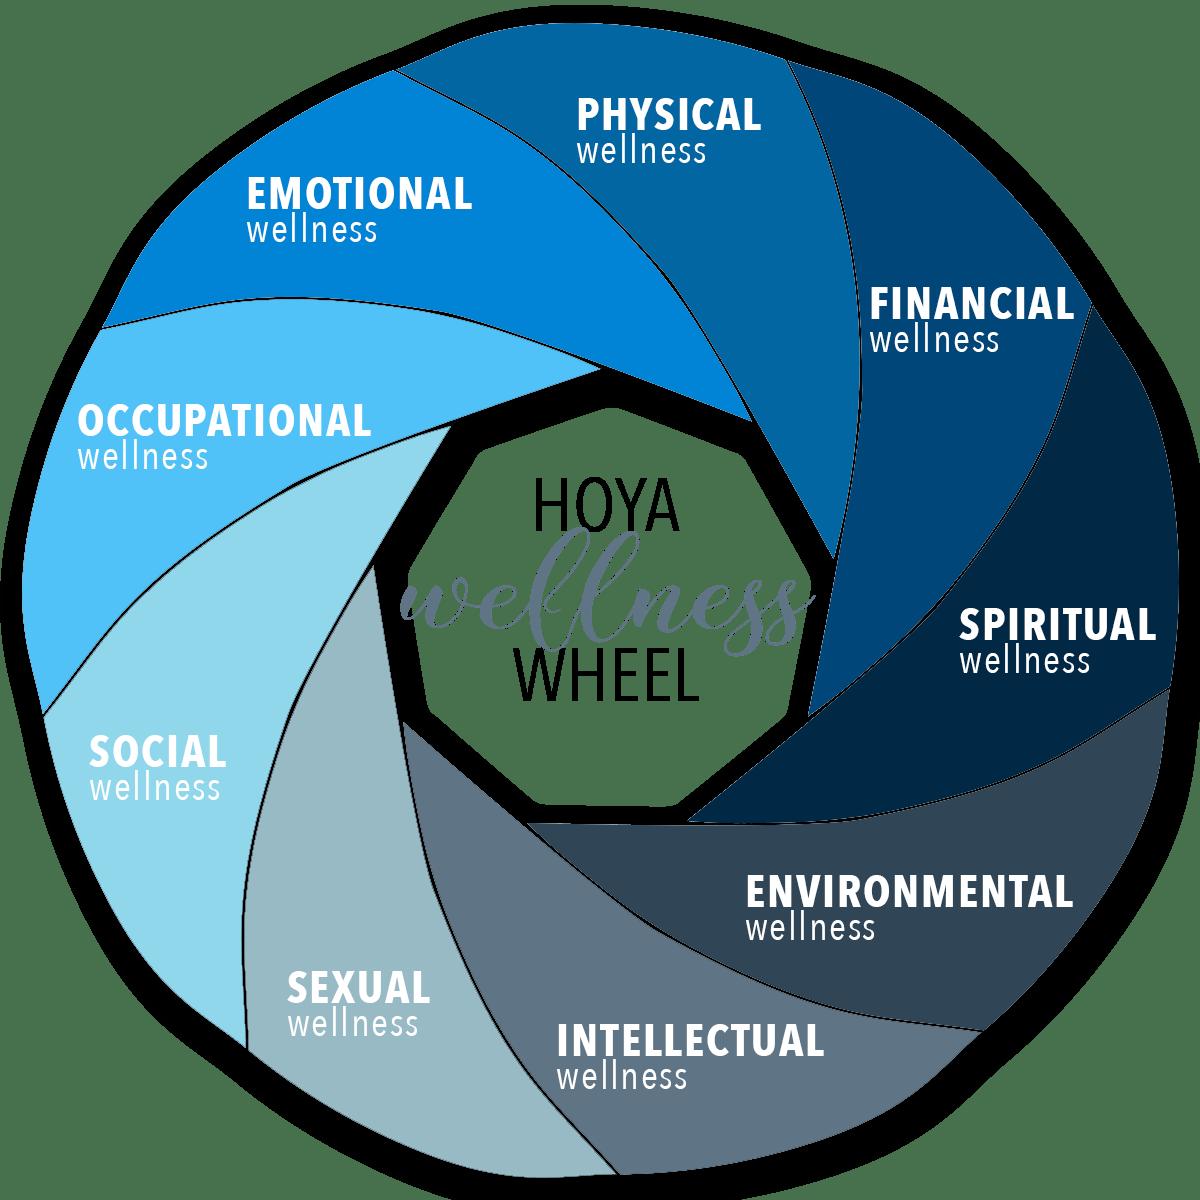 Hoya Wellness Wheel Amp Resources